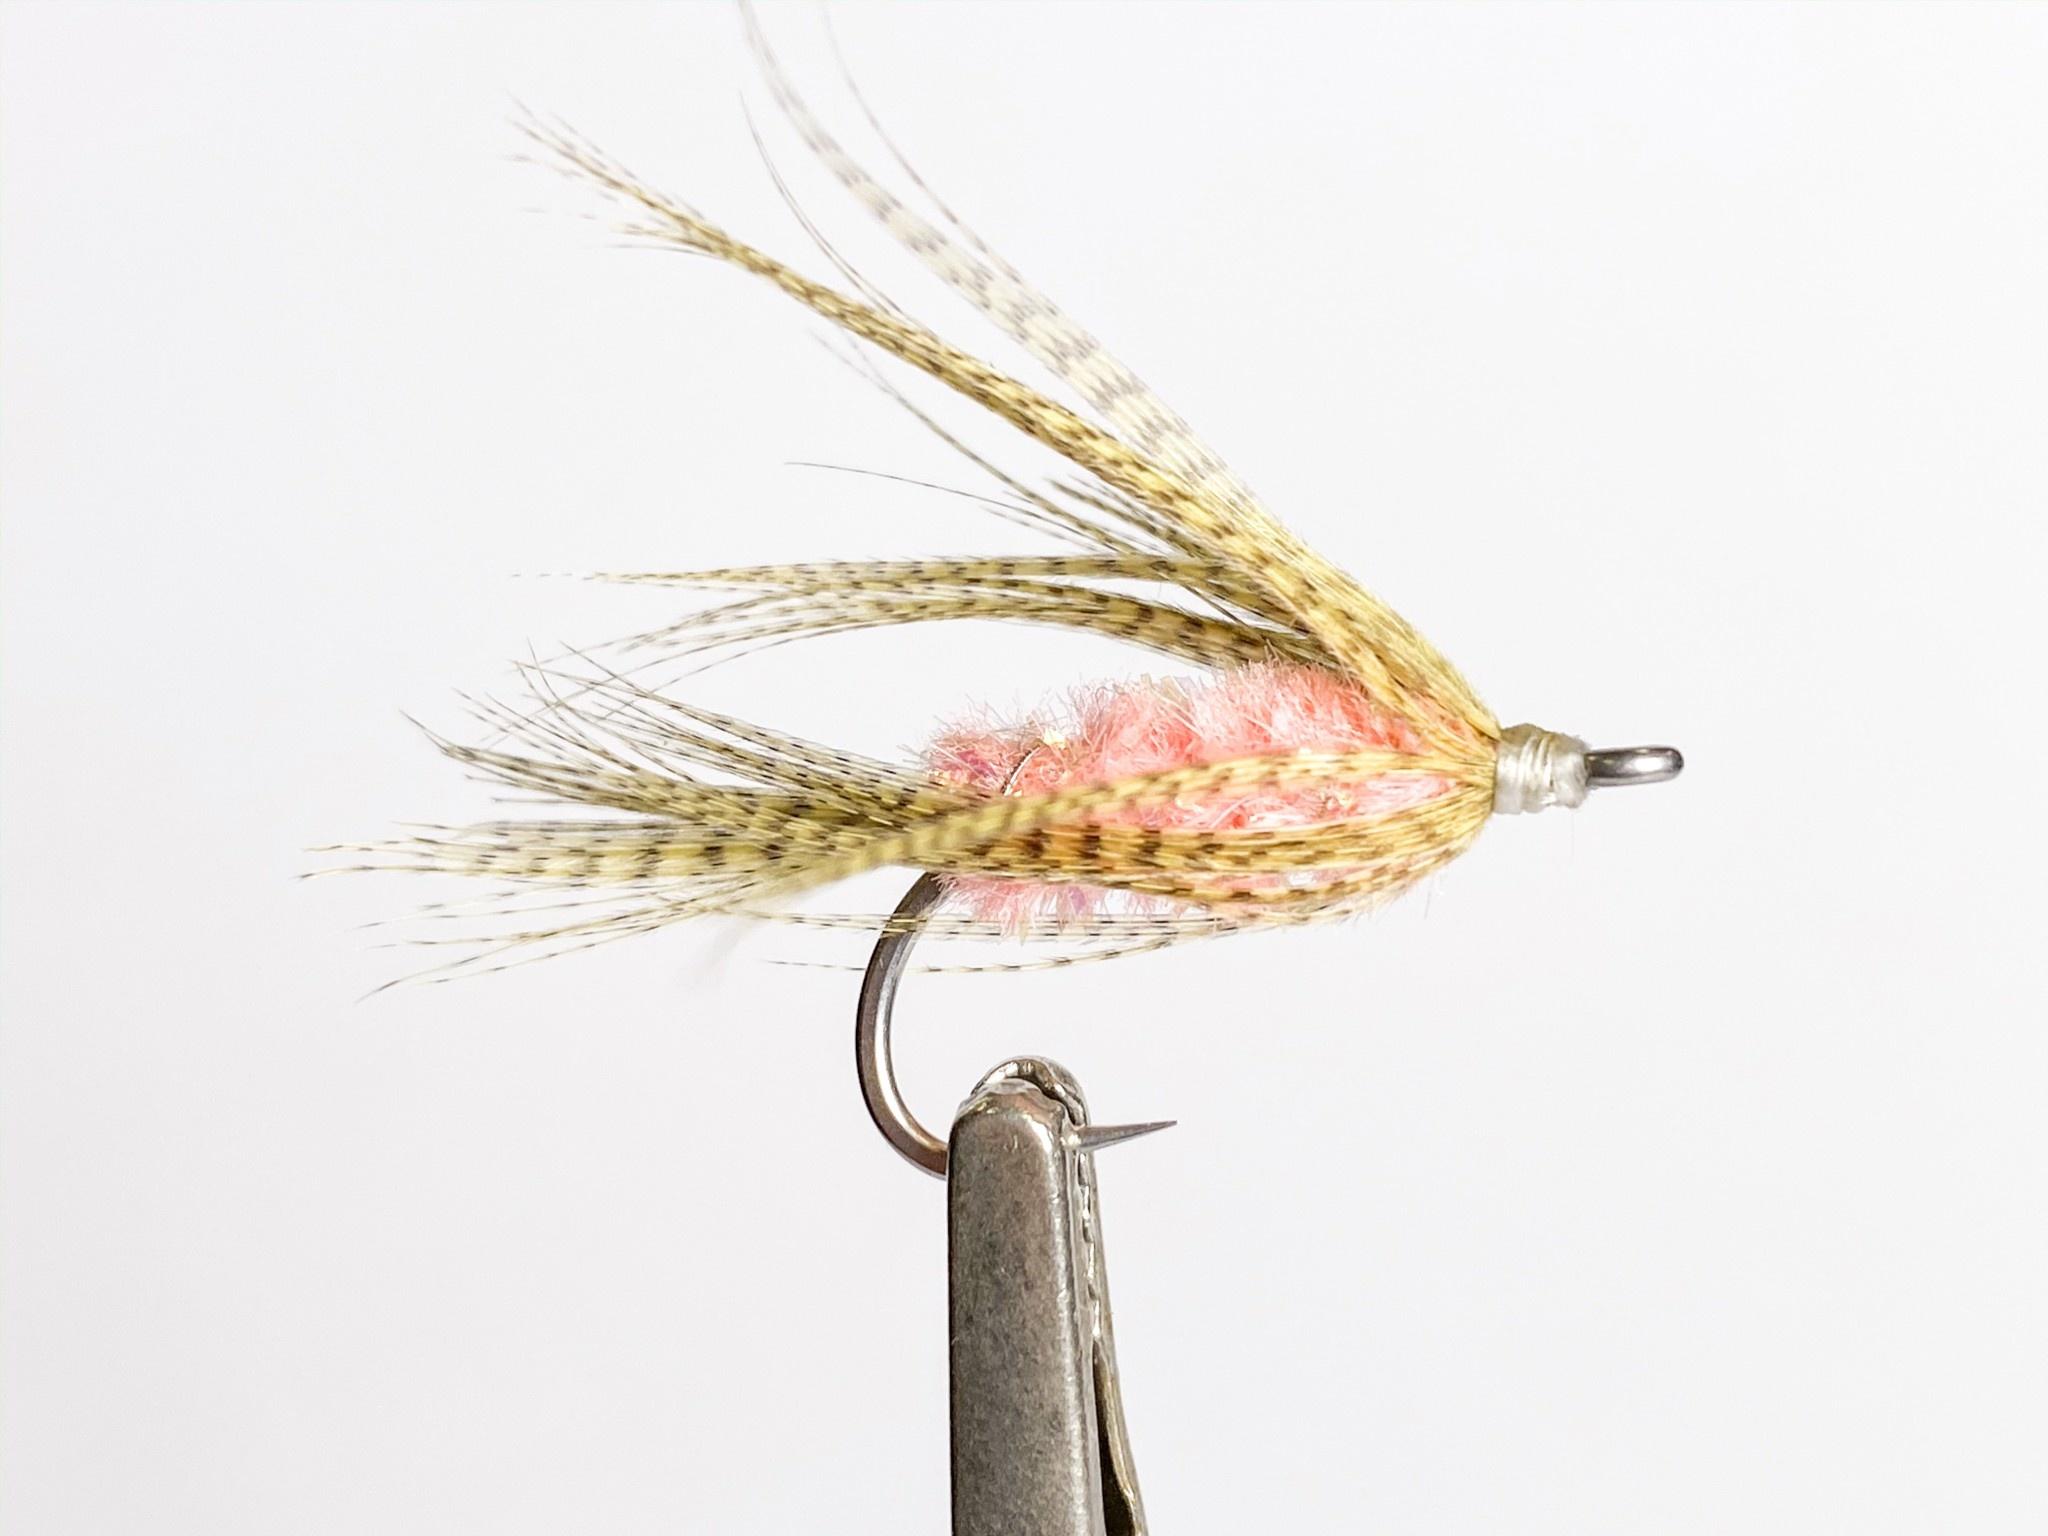 Gig Harbor Fly Shop Knudsen Cutthroat Spider size 6